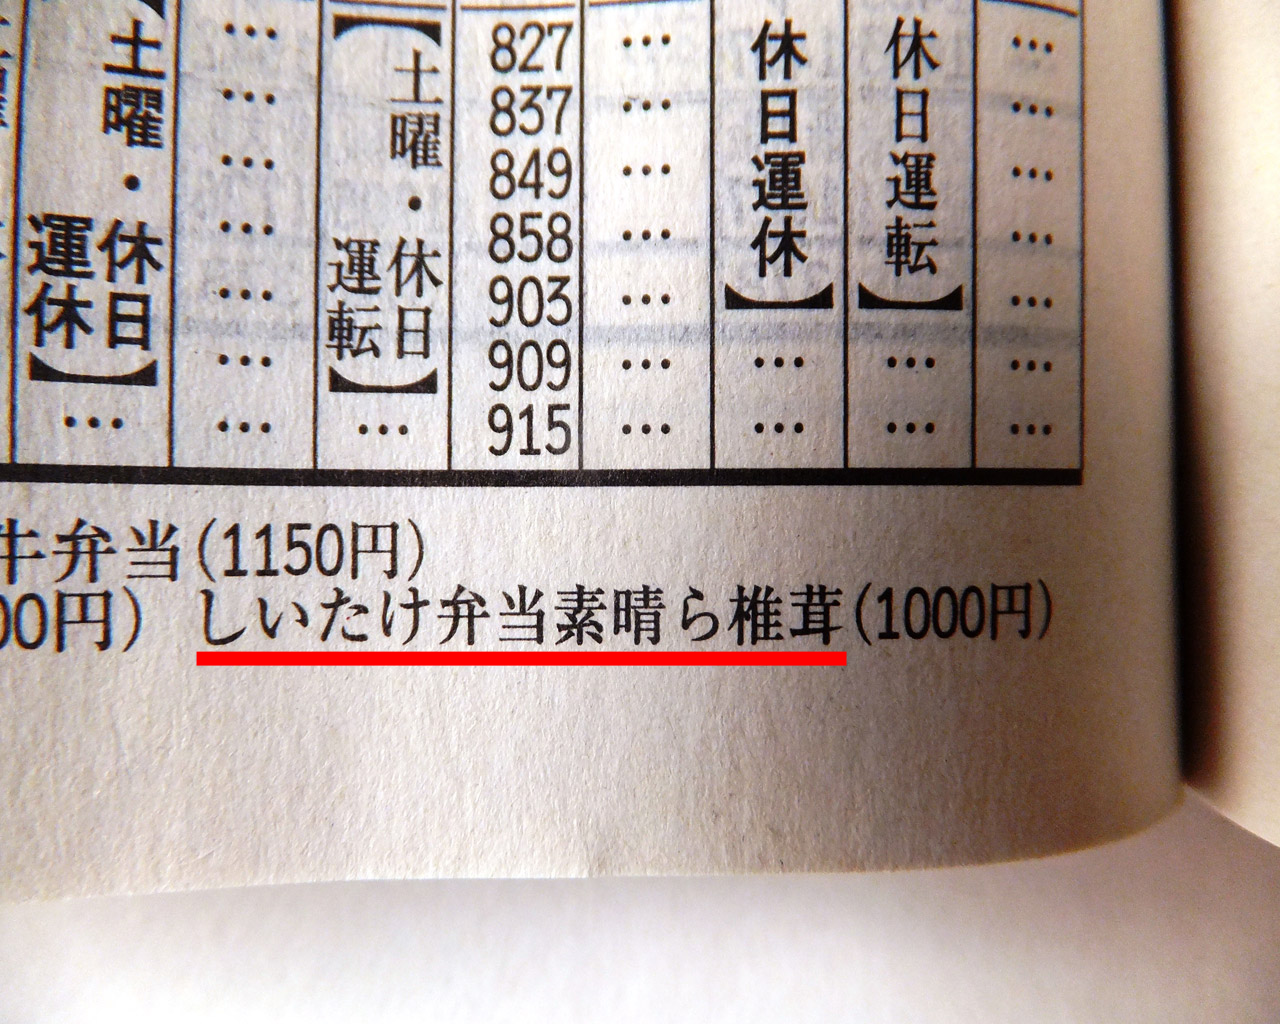 http://livedoor.blogimg.jp/warapappa/imgs/e/2/e2f2b25a.png